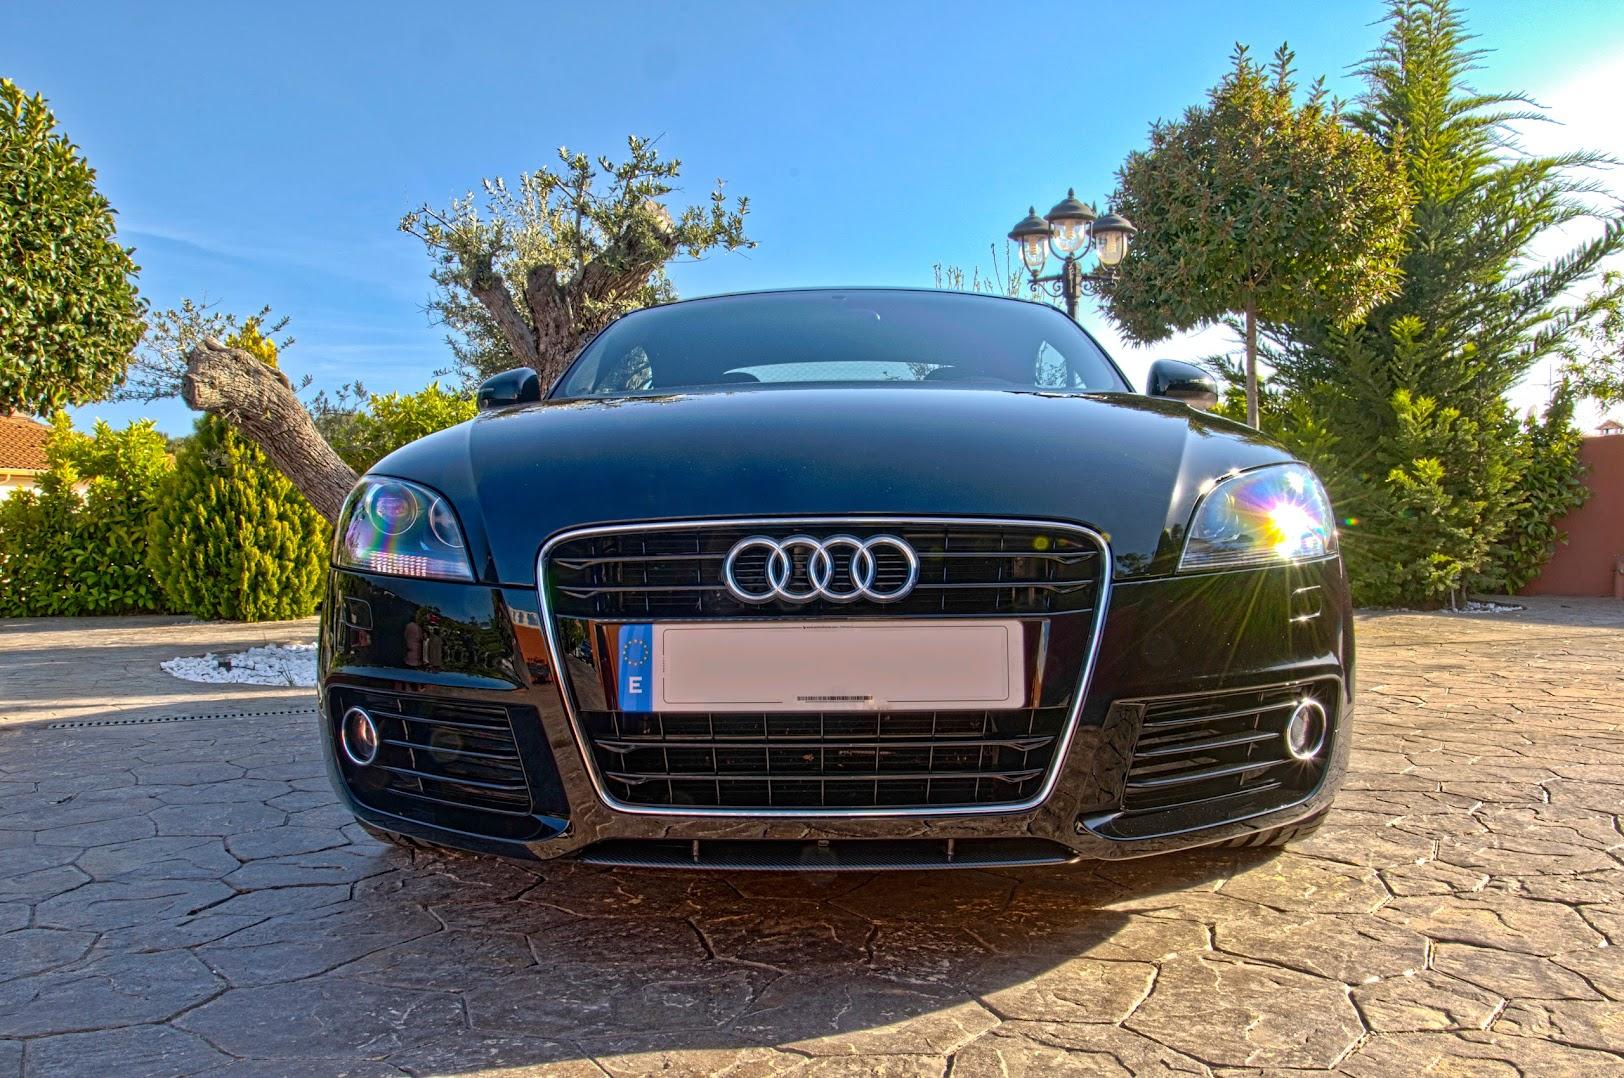 Audi+TT+-+Reportaje+2+-+Editadas+02.jpg